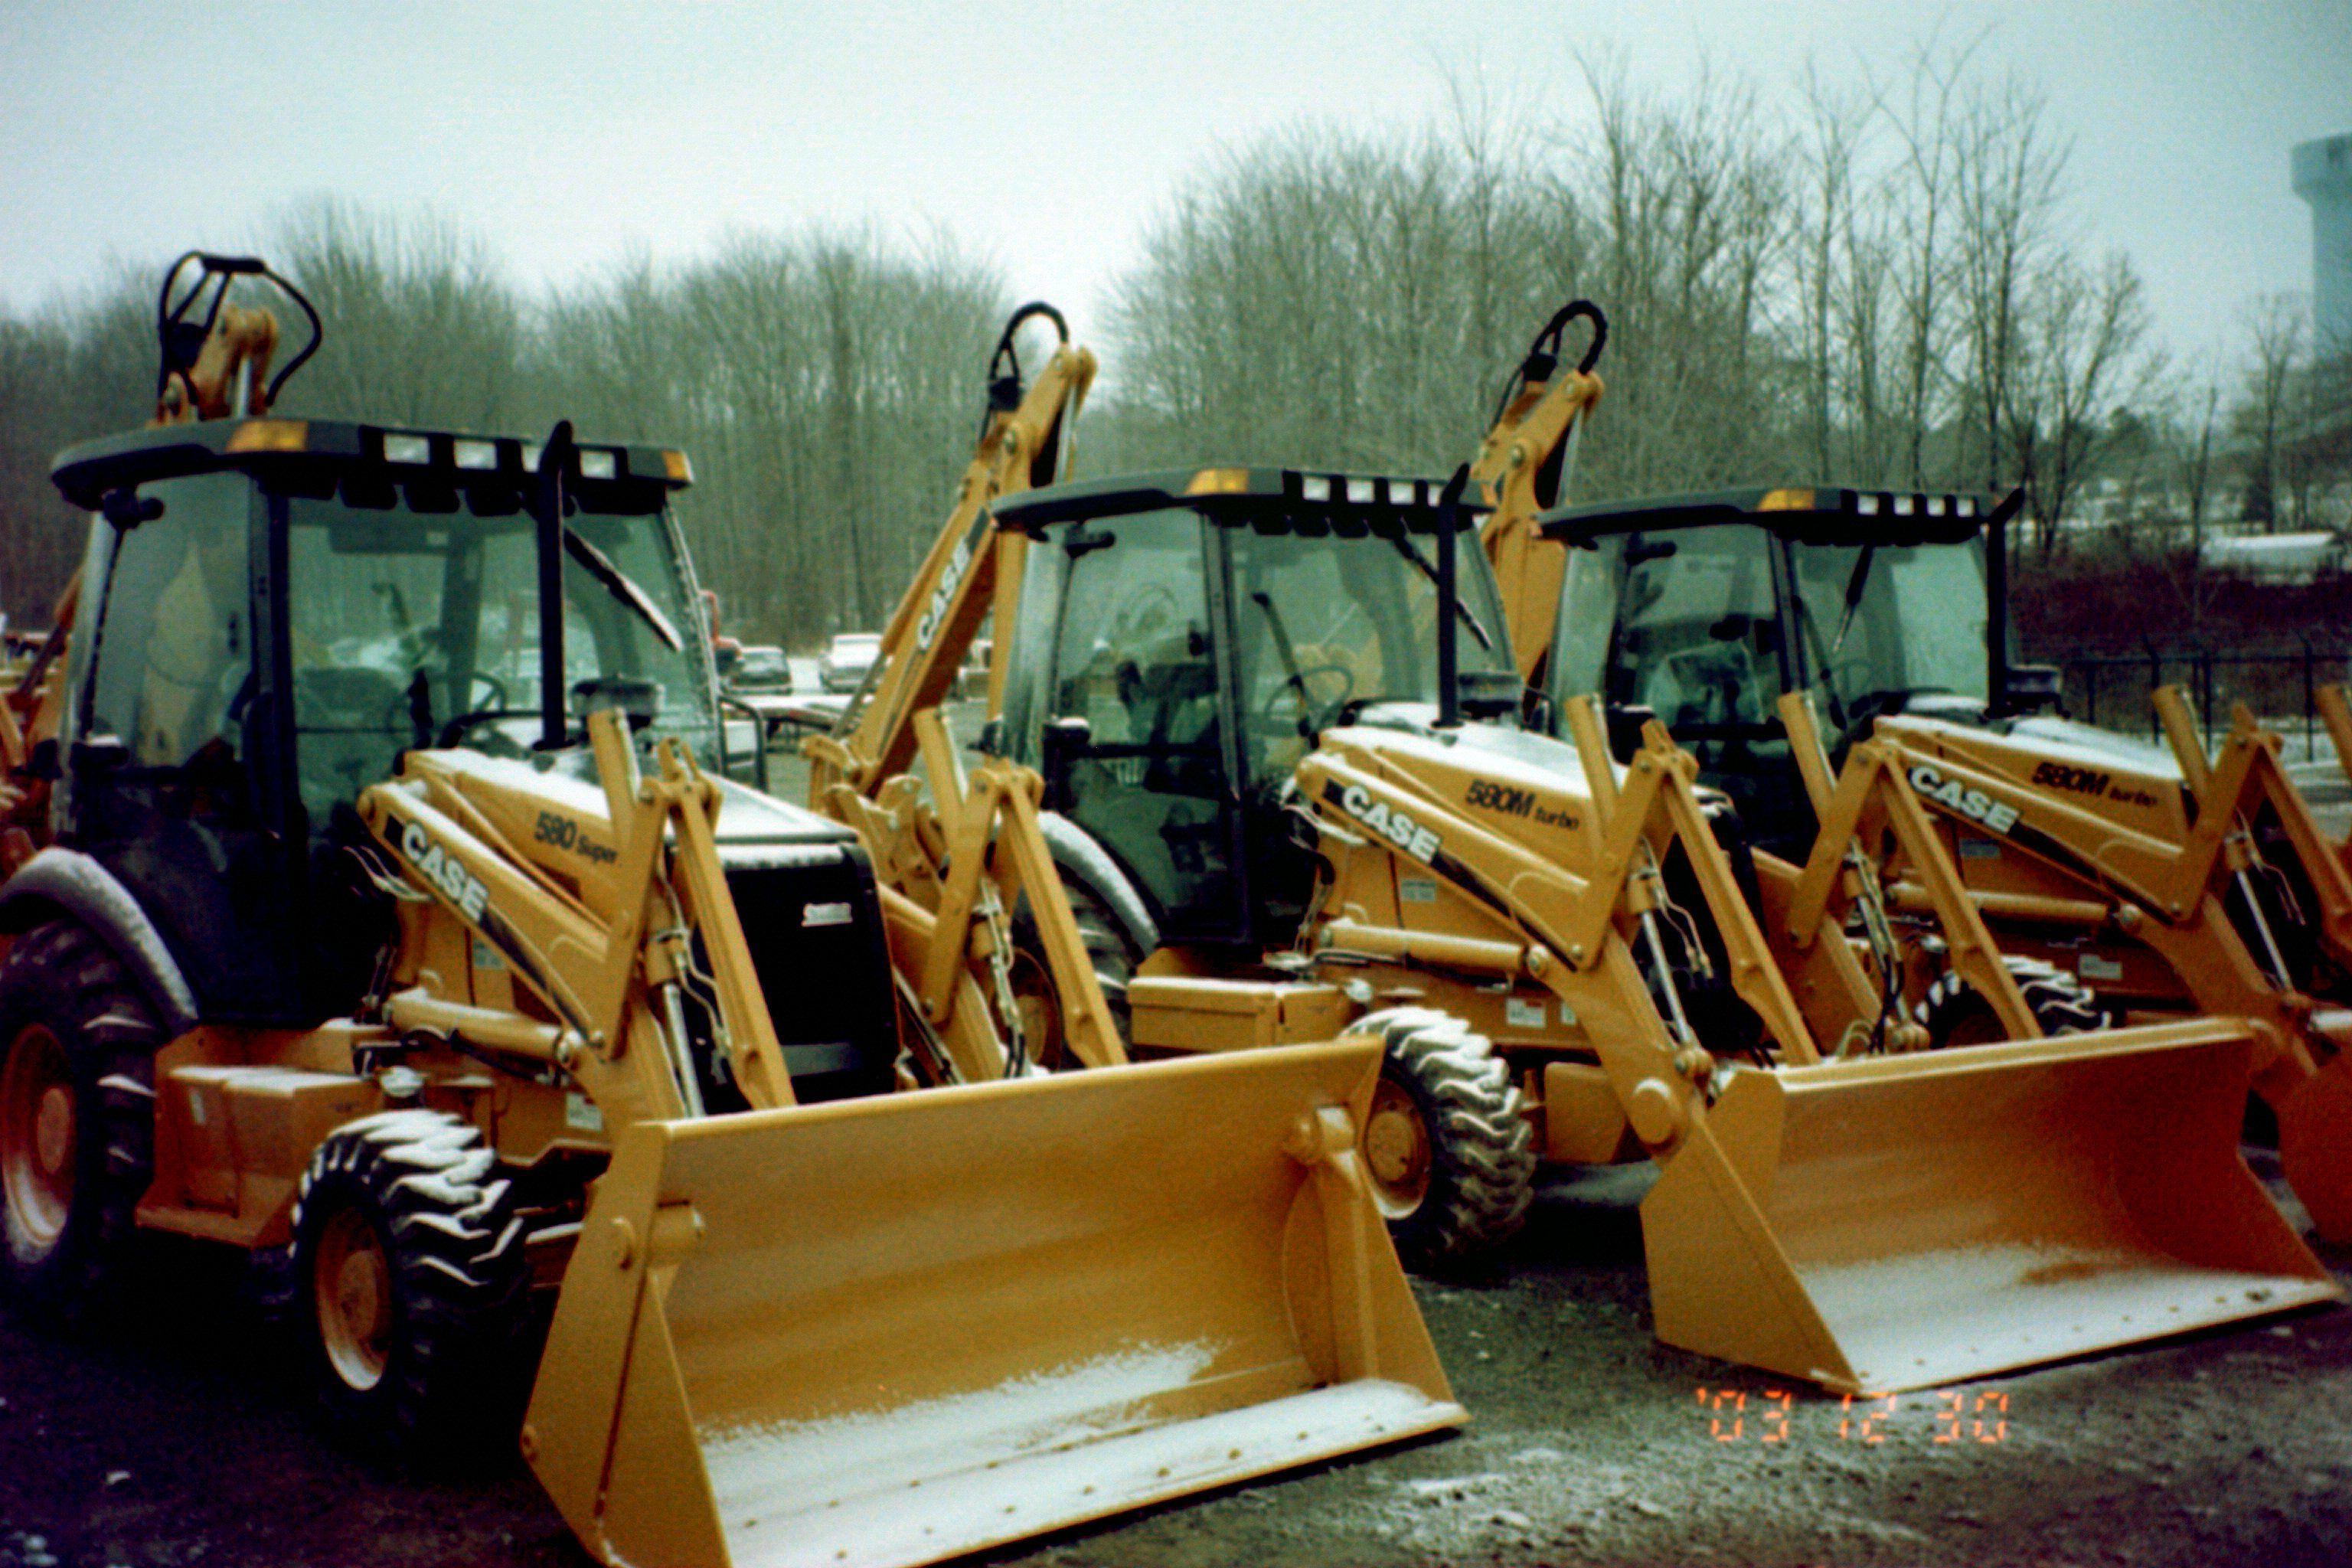 Case 580 backhoes in Erie,Pa | Case Construction equipment